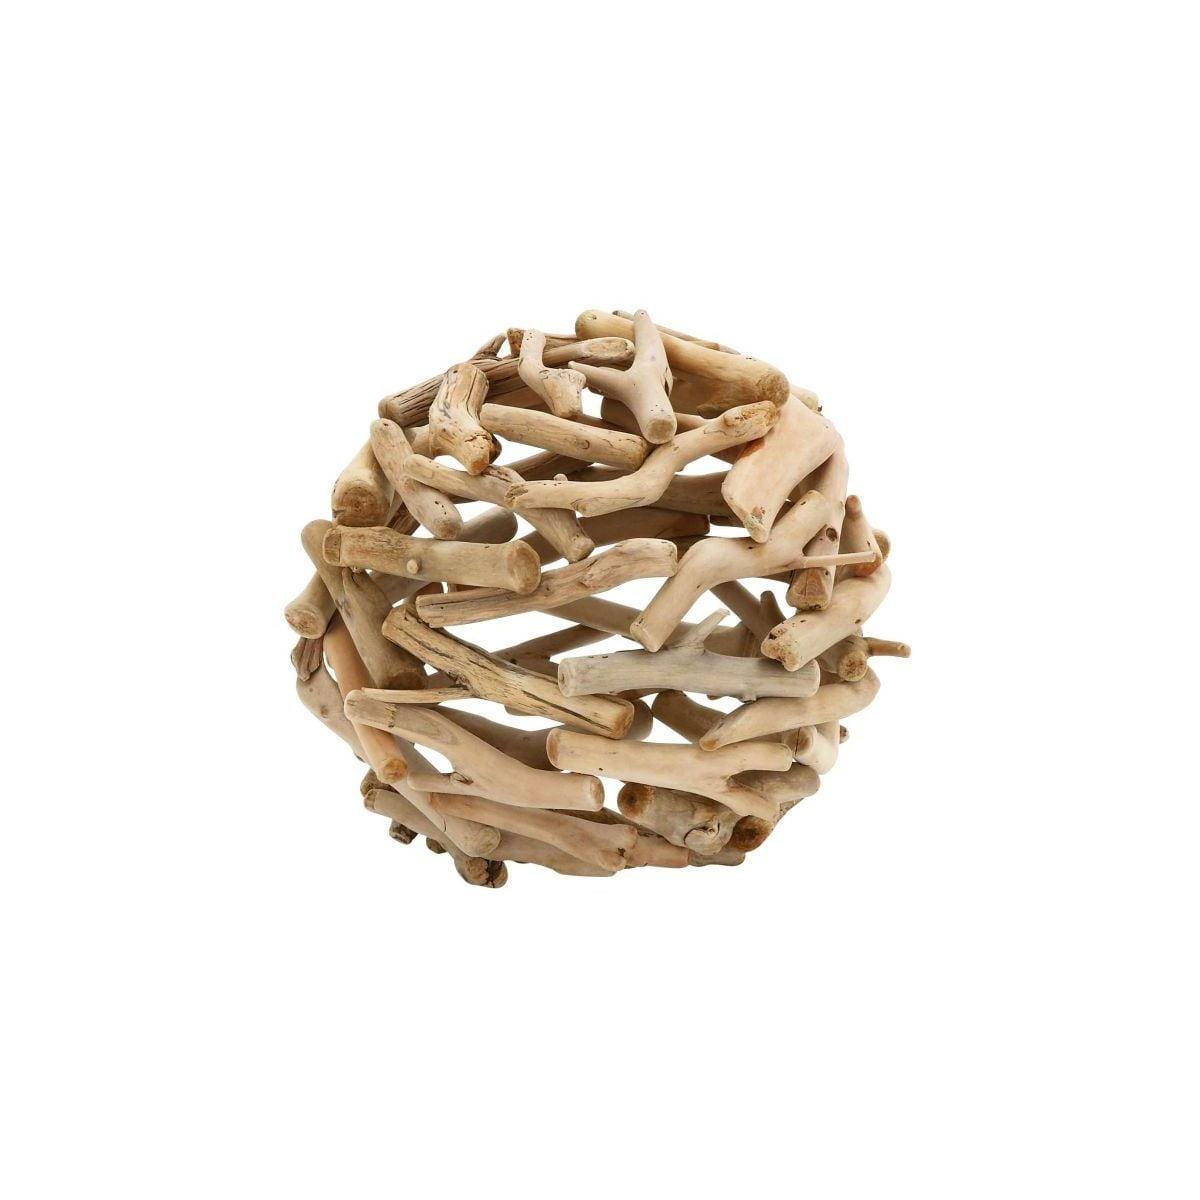 Driftwood 9-inch Deco Ball